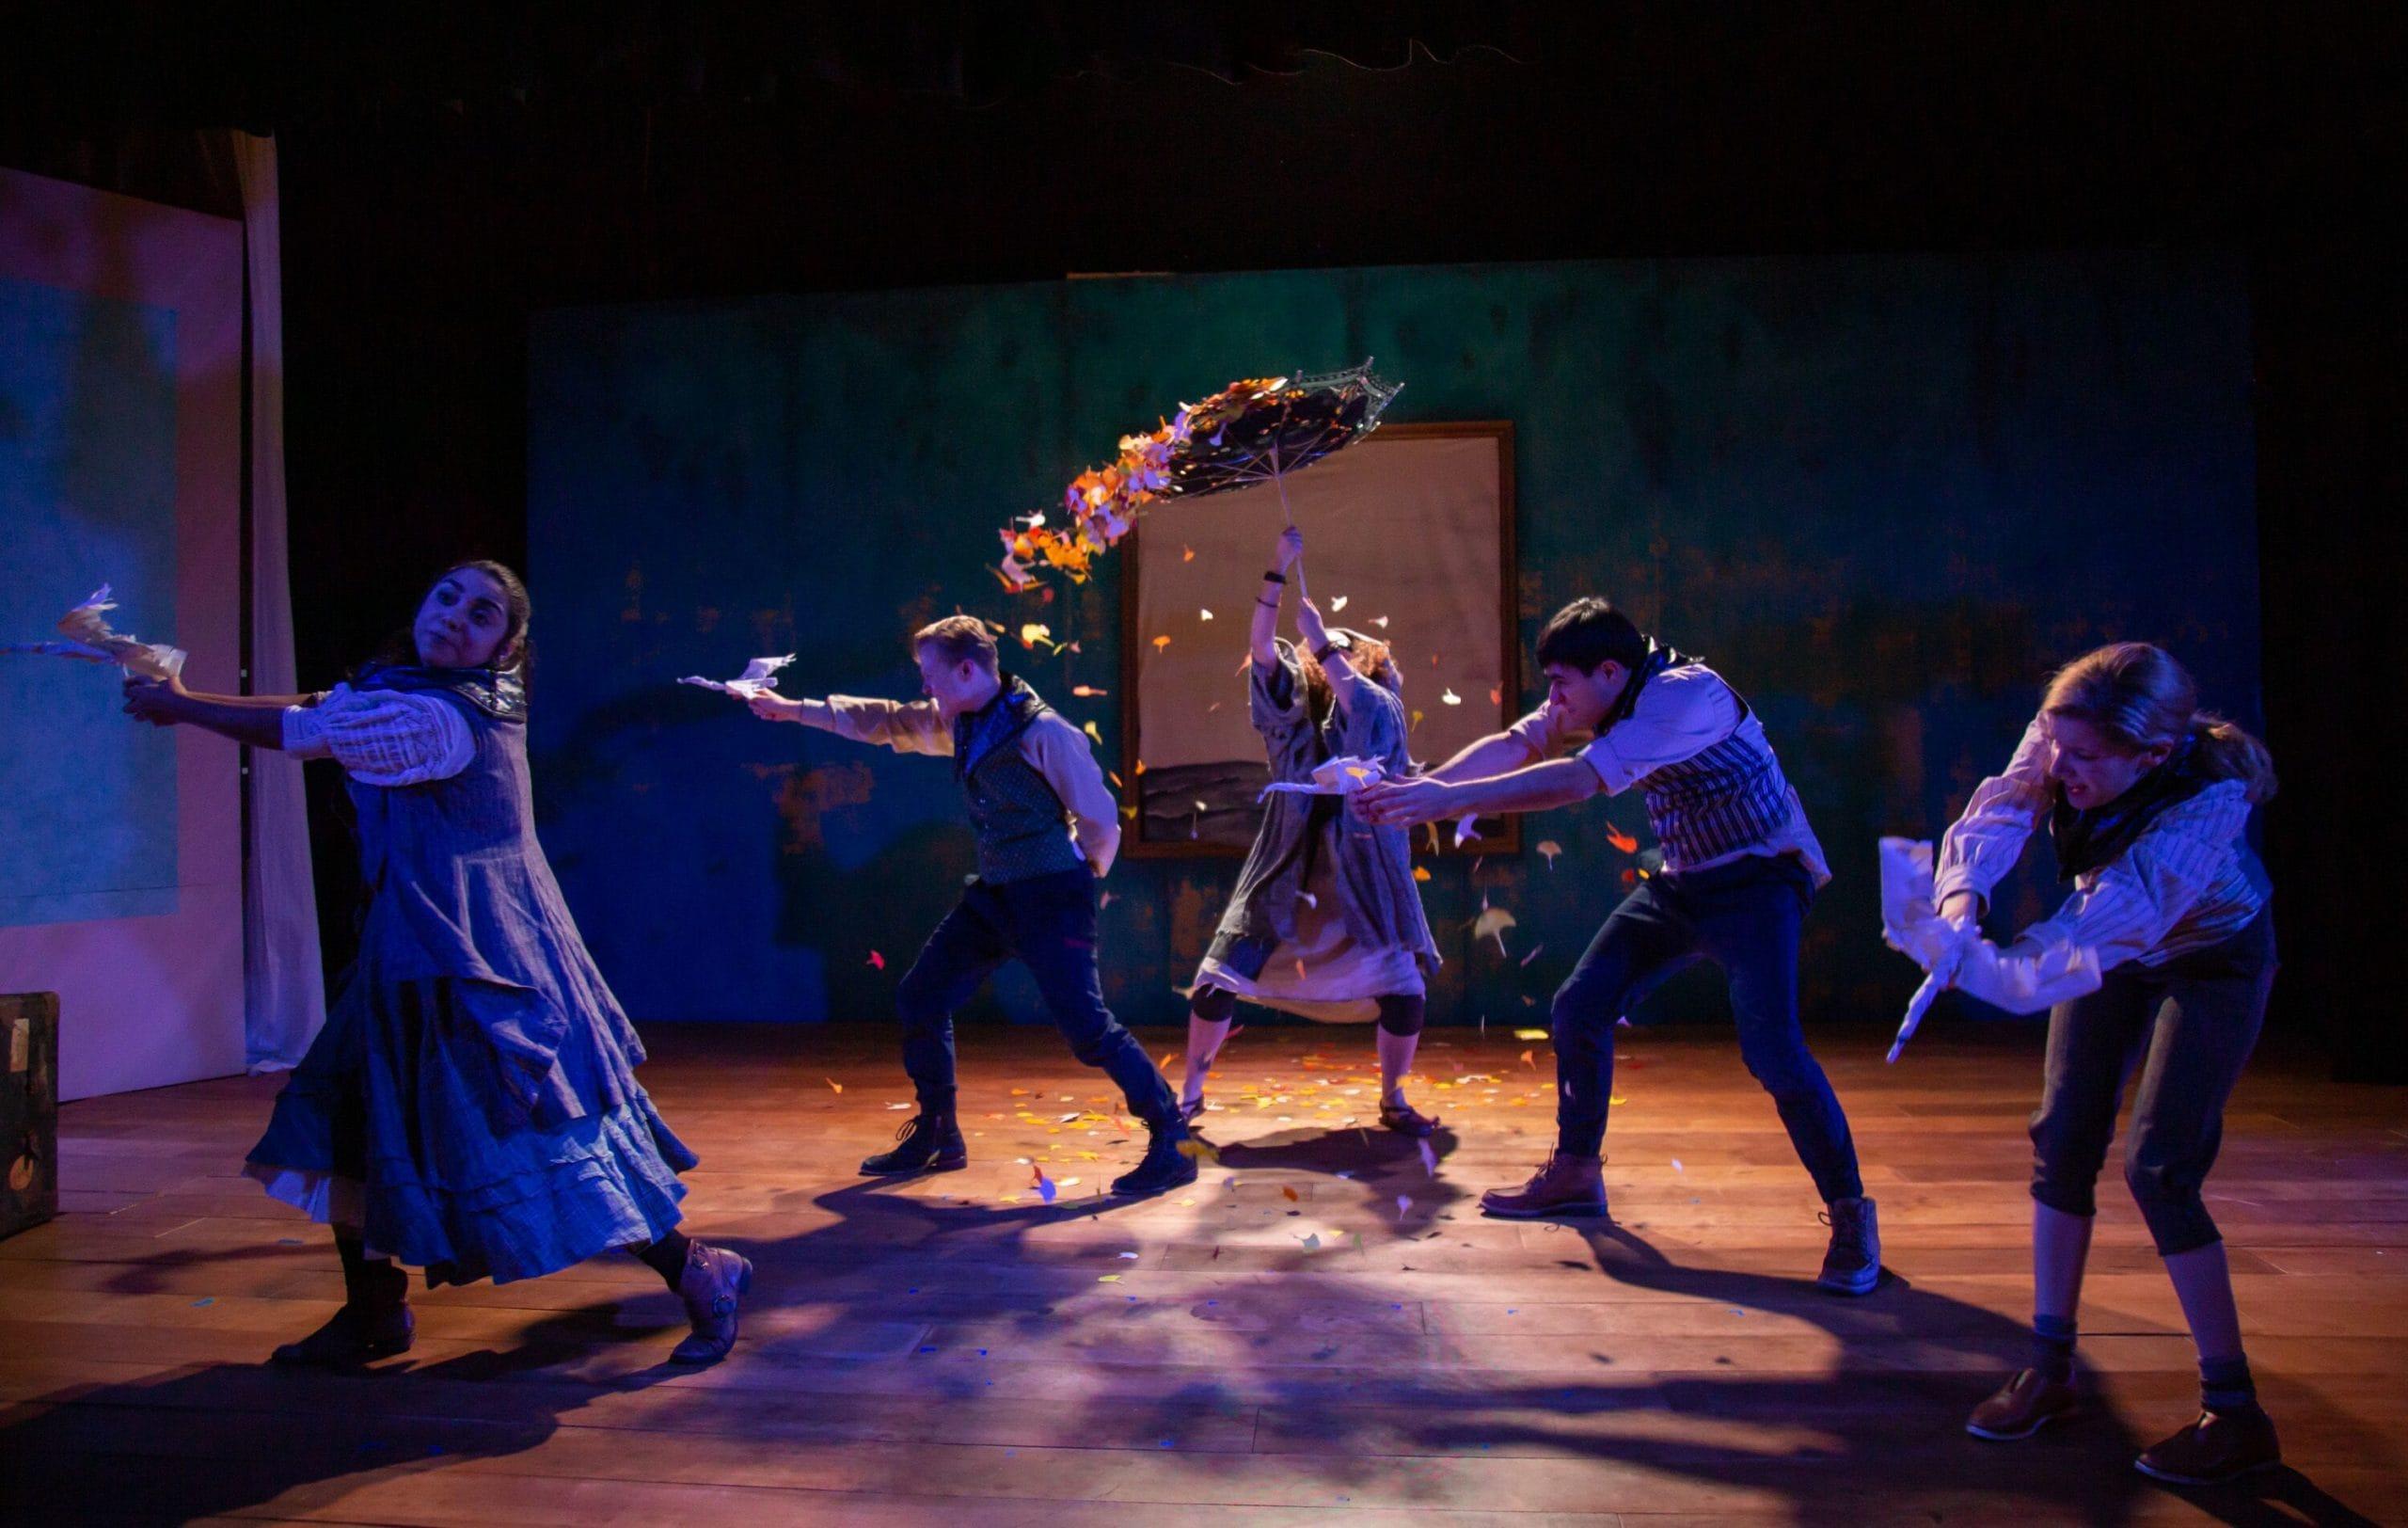 Jordana Hernandez (Finnoughla), Seth Rosenke (Fiachra), Melissa Carter (ensemble), Niusha Nawab (Aed) and Emily Sucher (Conn) in 'The Infinite Tales' by 4615 Theatre Company. Photo by Ryan Maxwell Photography.